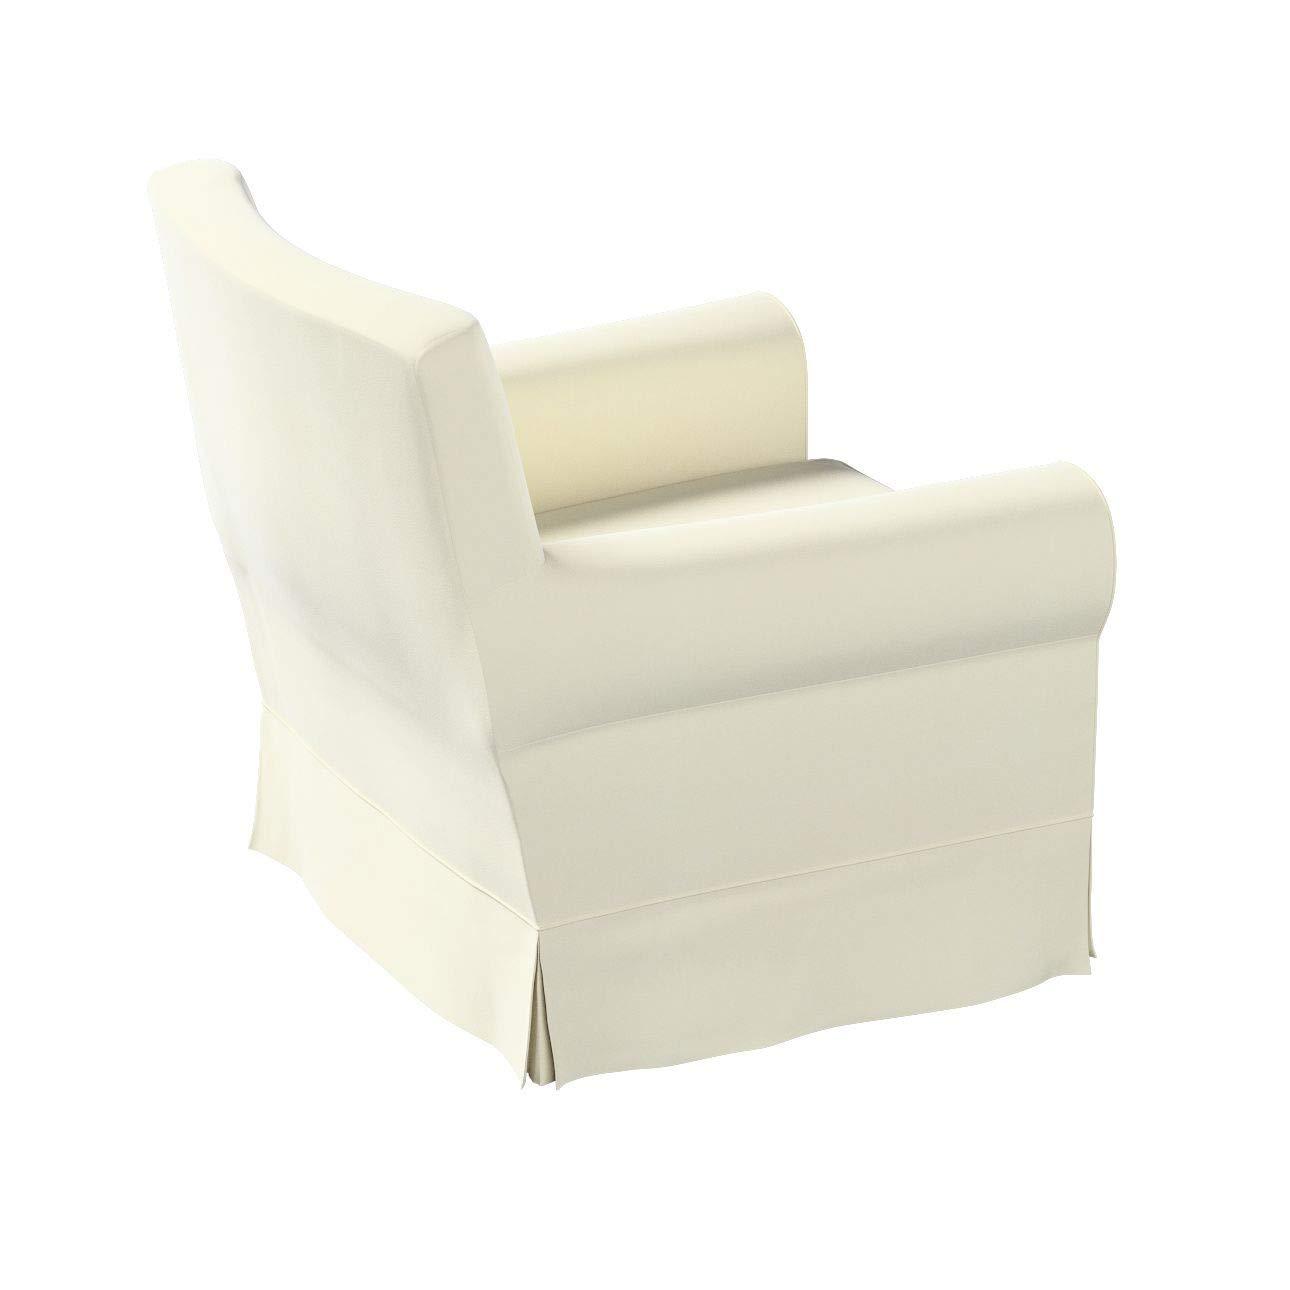 Dekoria Ektorp Jennylund Sesselbezug Sofahusse passend f/ür IKEA Modell Ektorp altwei/ß